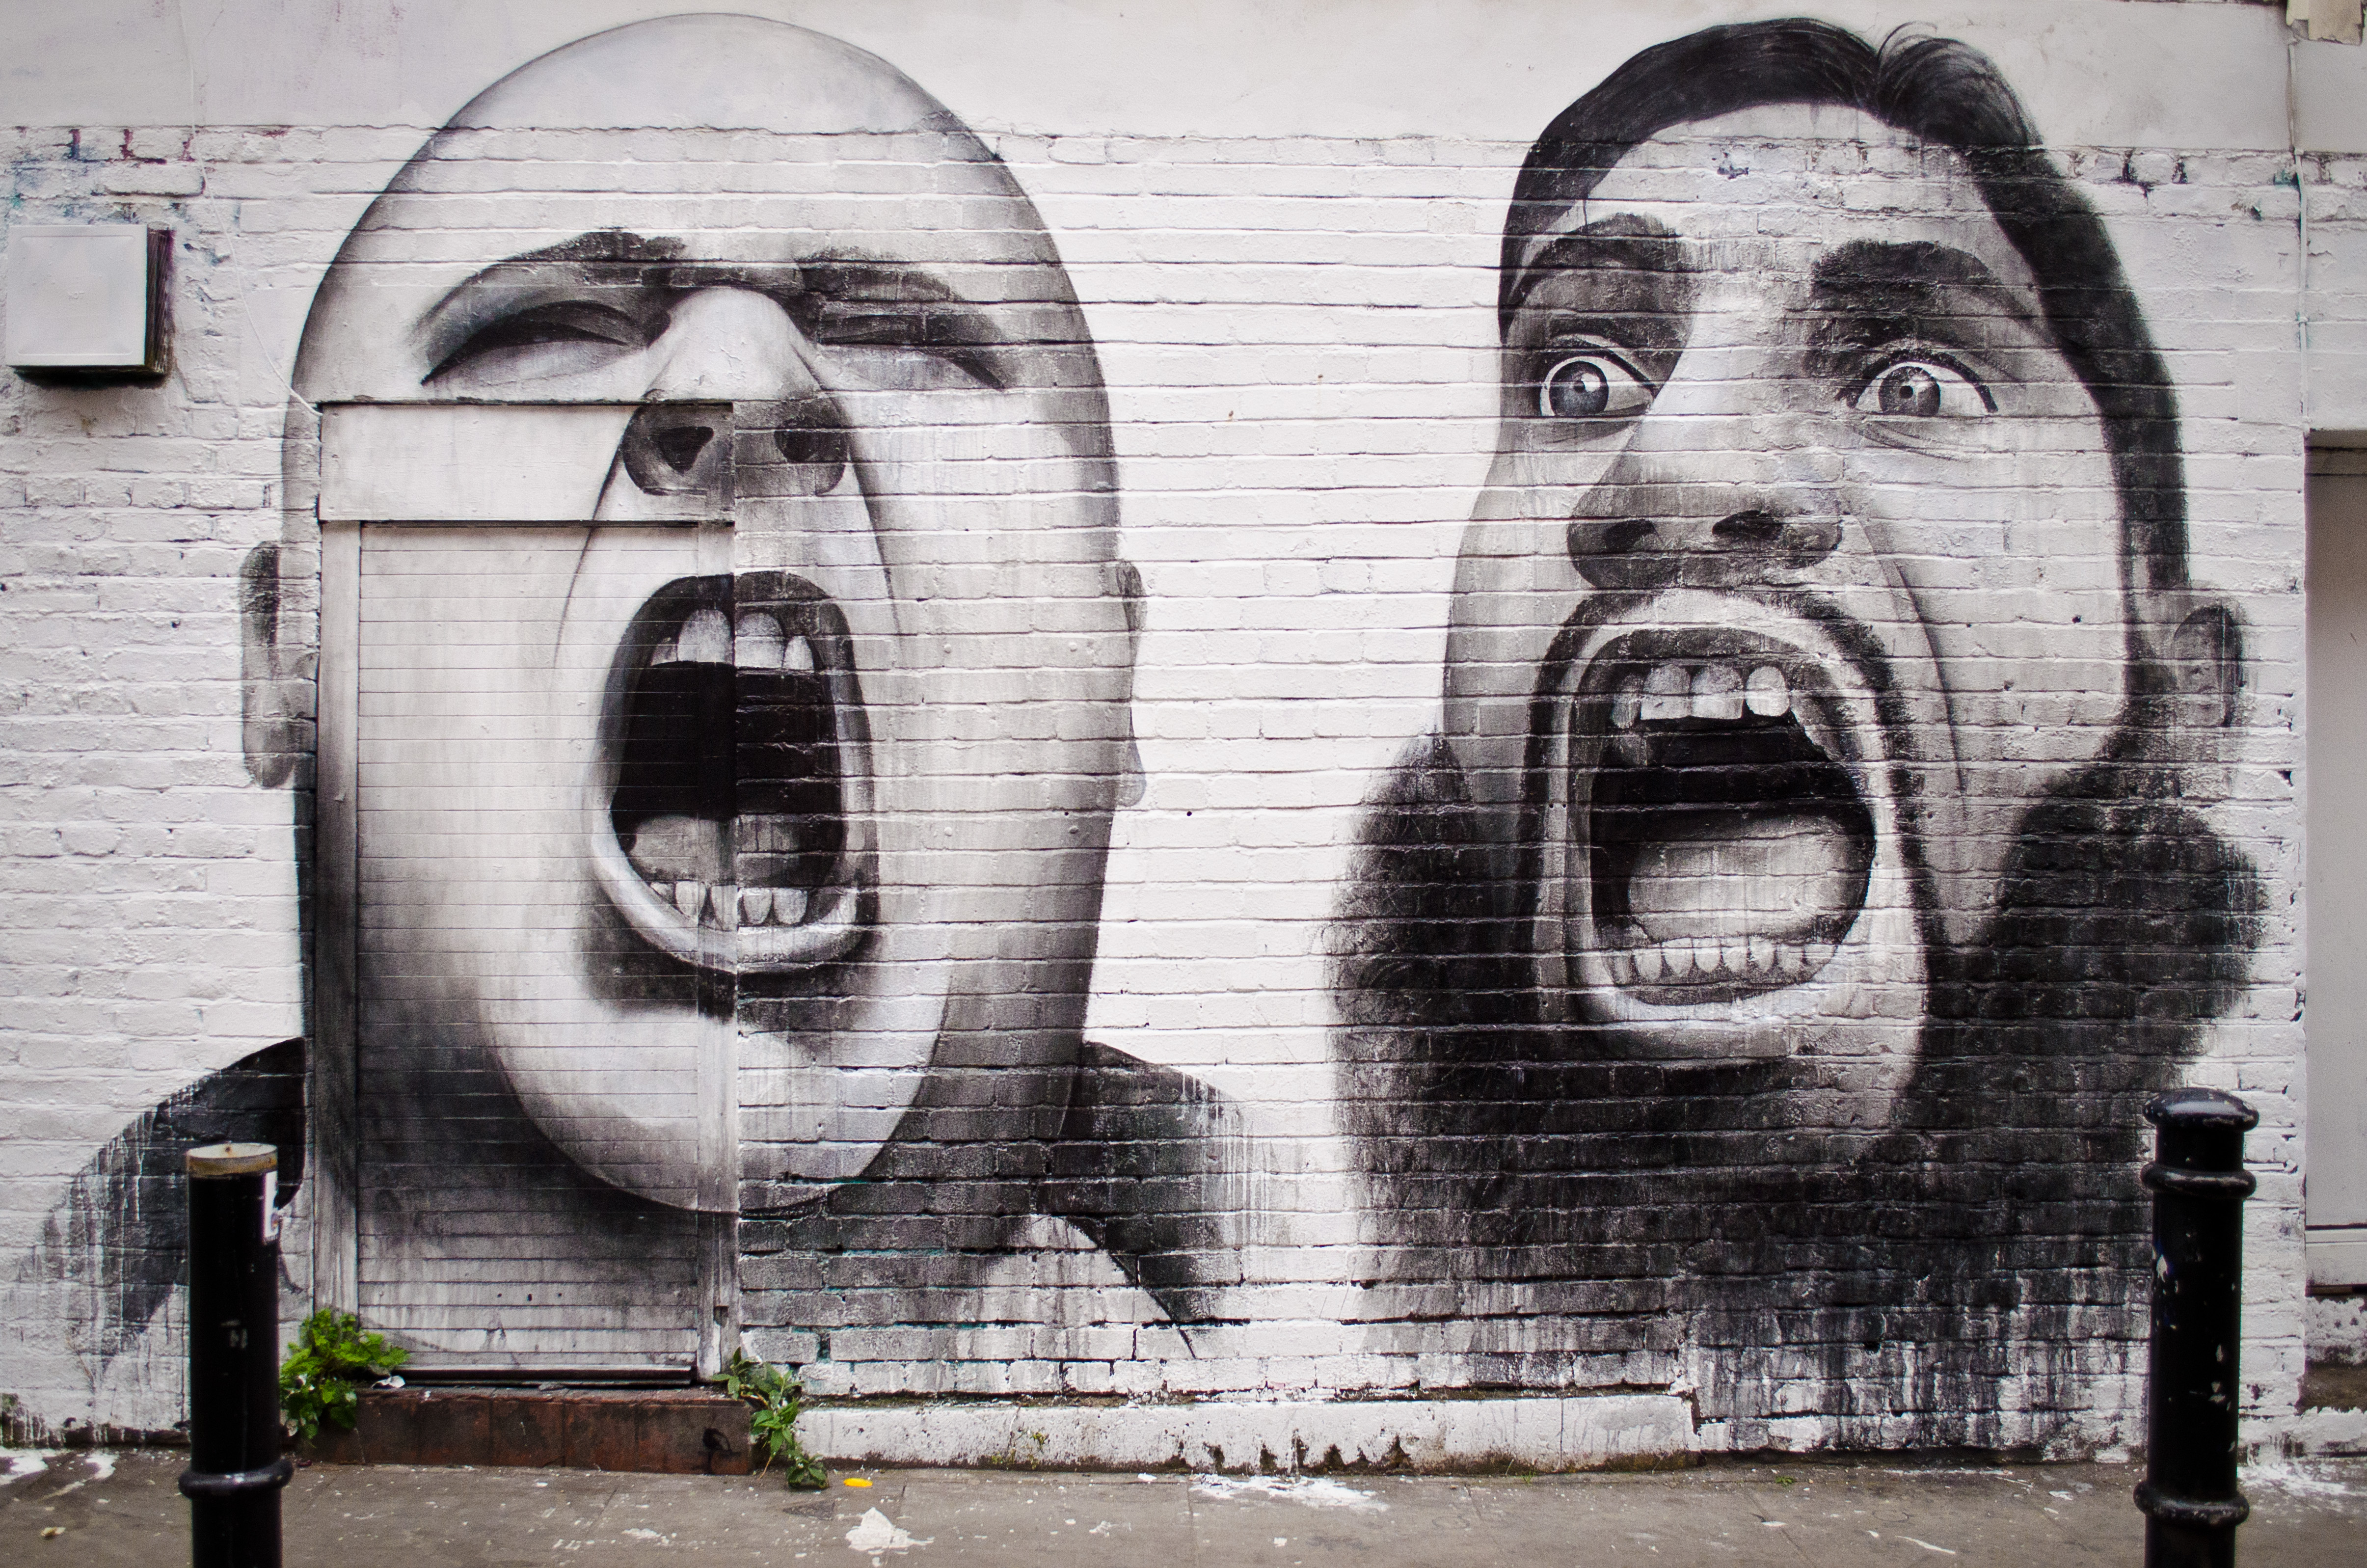 Shout wall